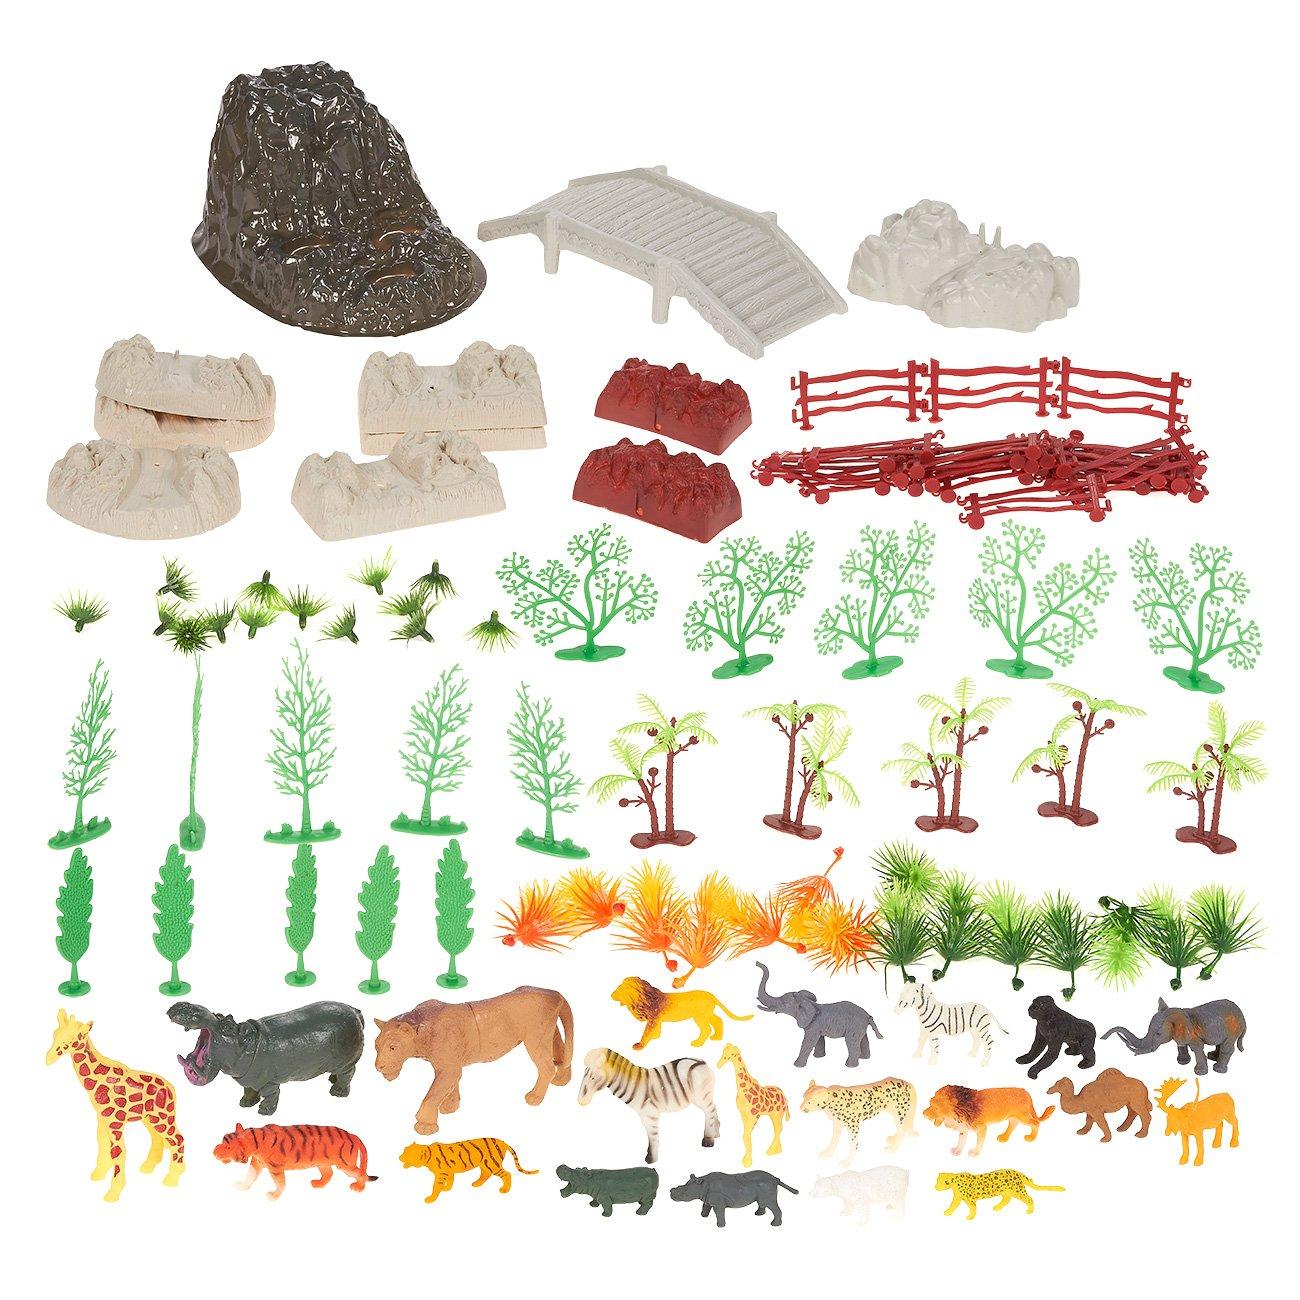 Plastic Zoo Animal Toys 100 Pack Zoo Animal Figures Set Small Zoo